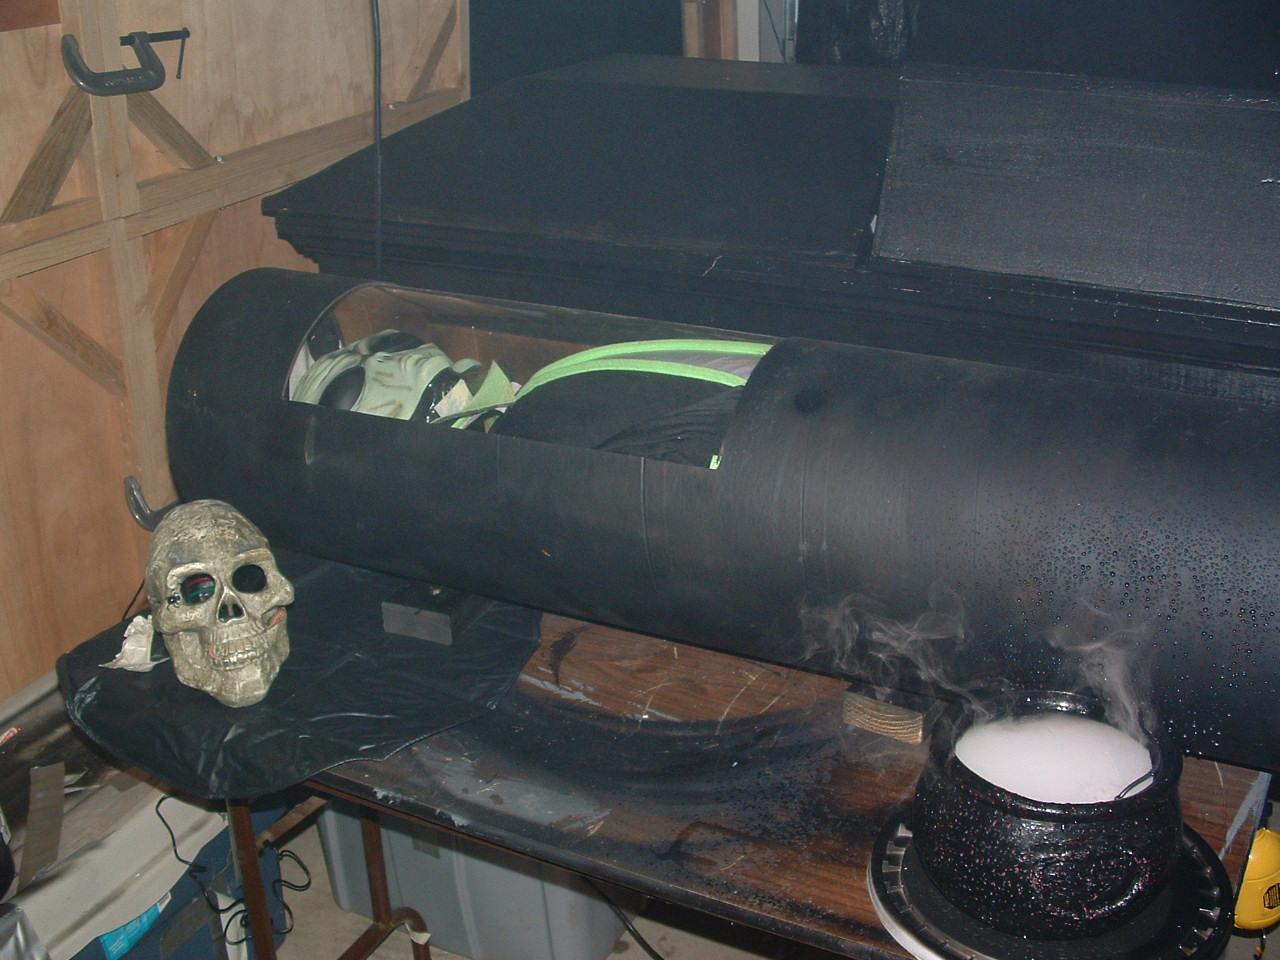 Picture of Alien Sleep Tube